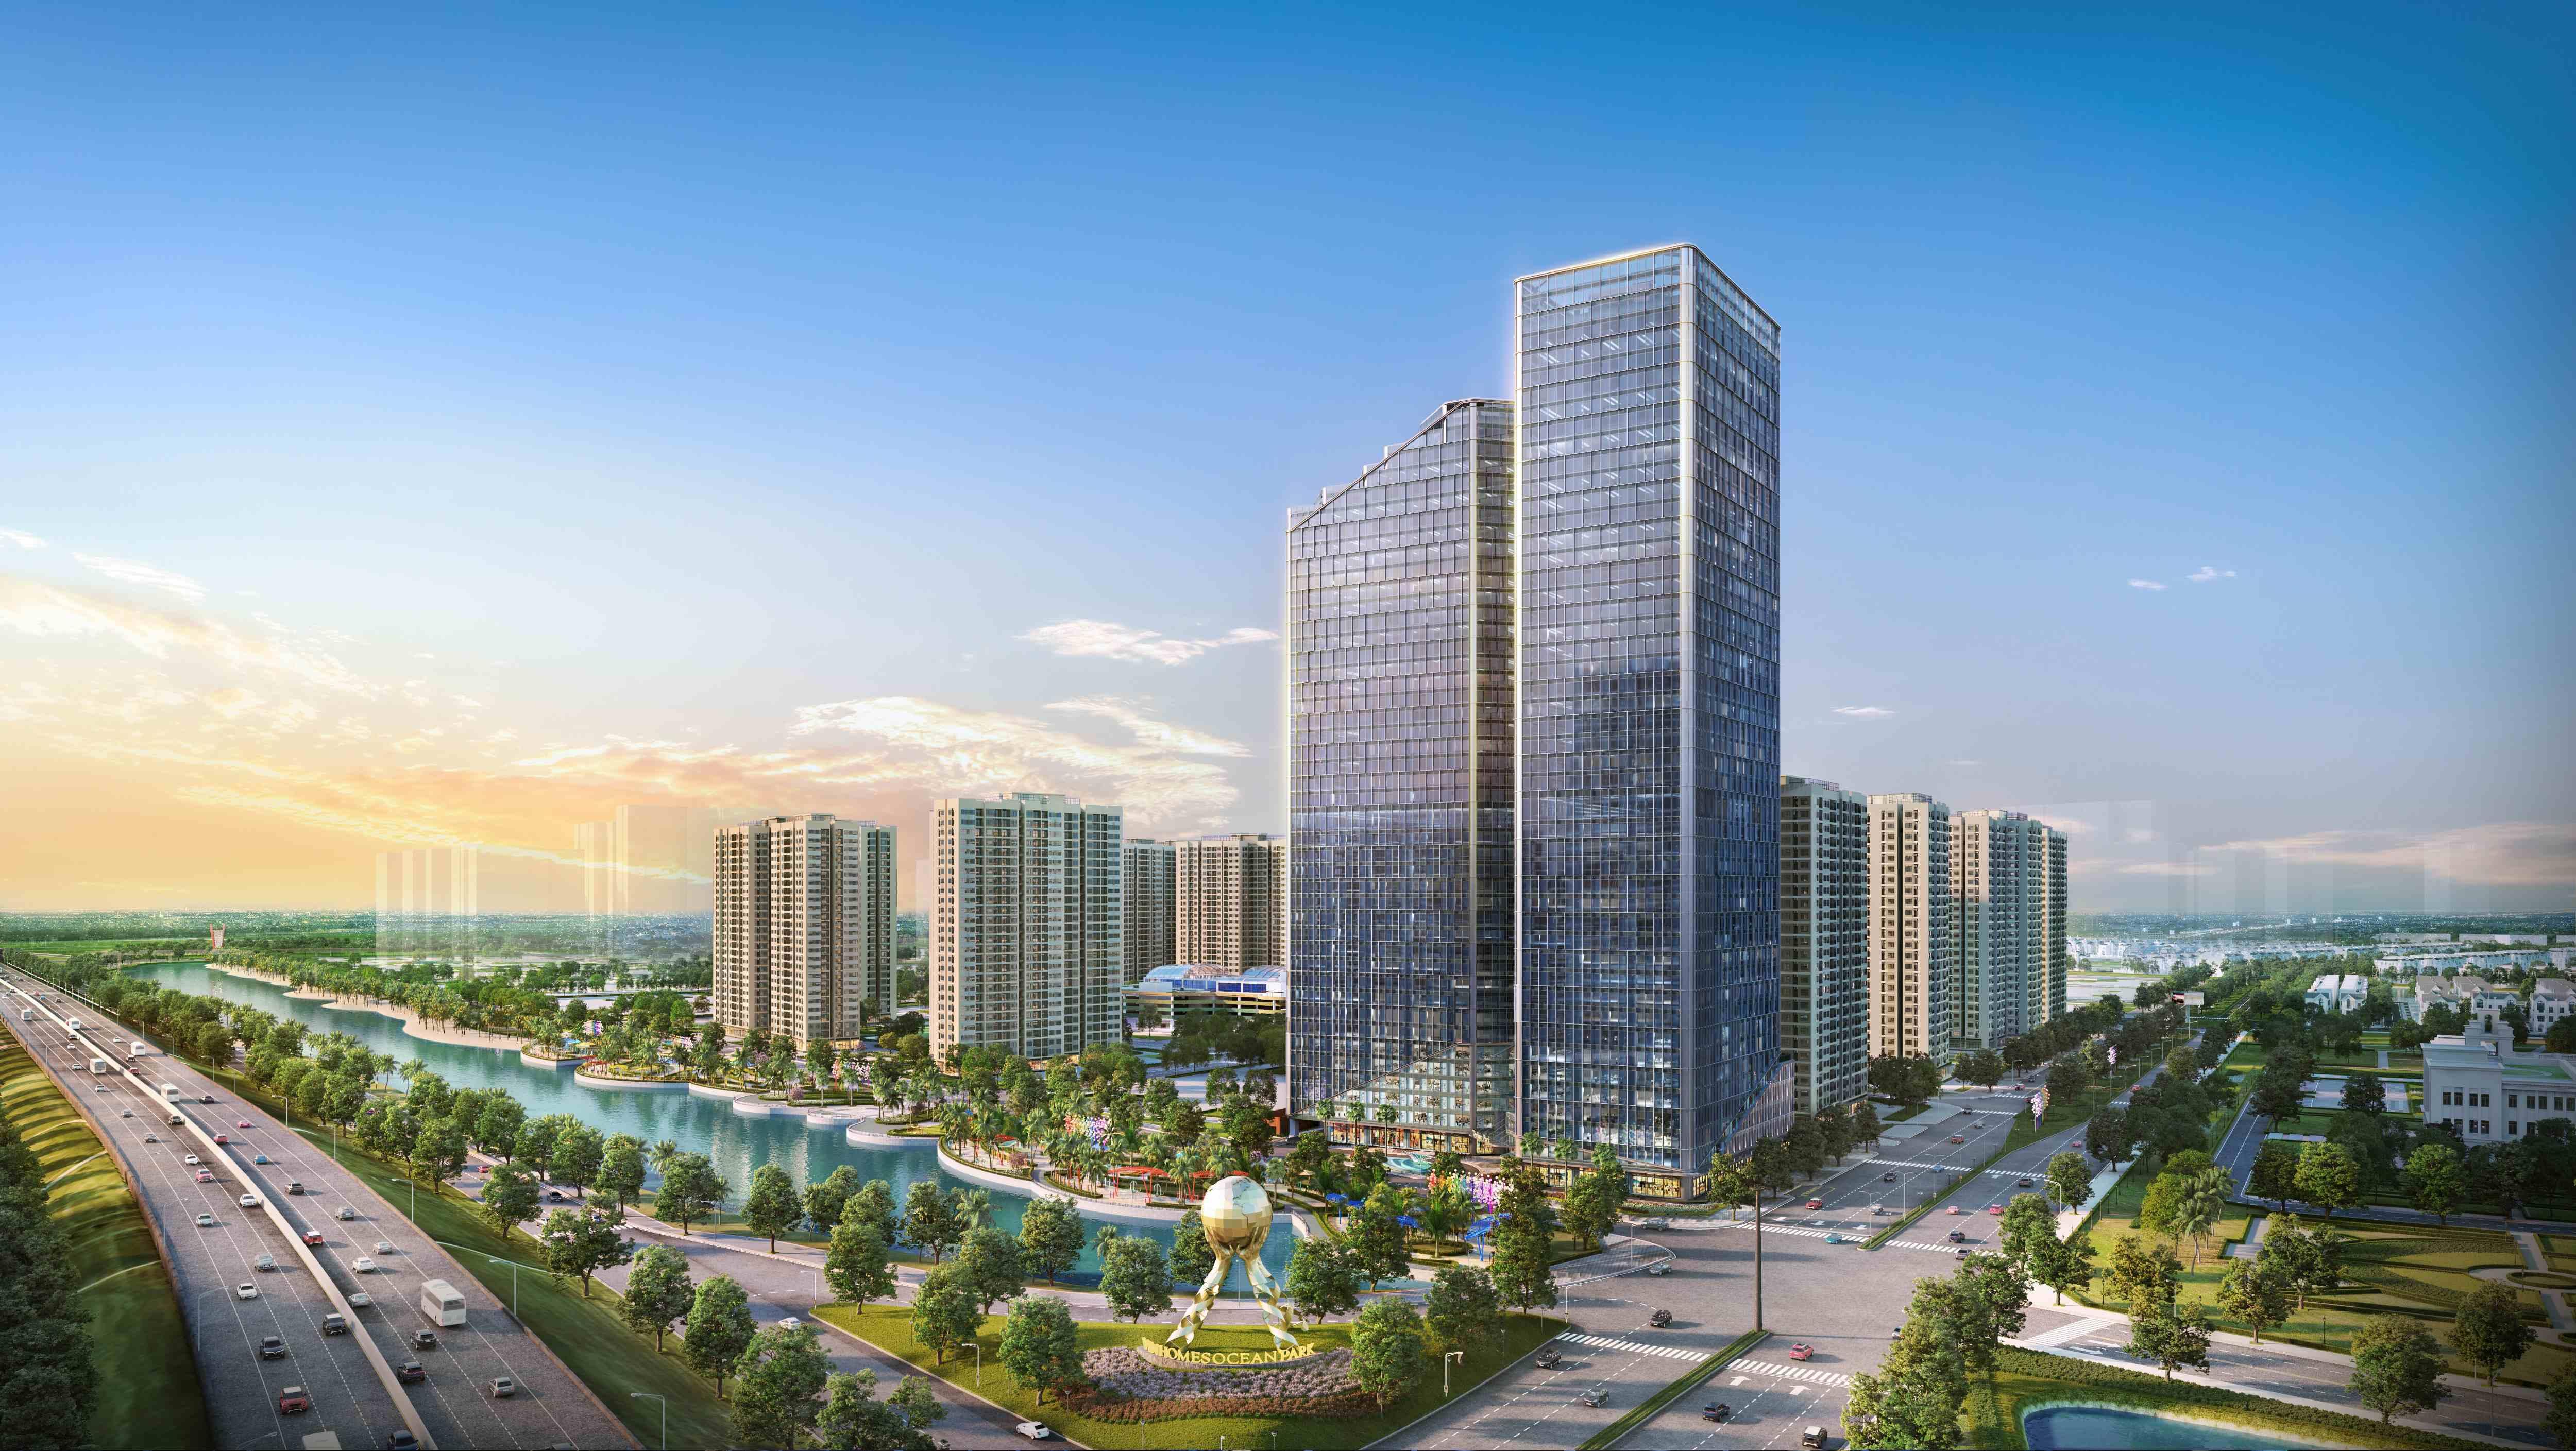 Hinh anh TechnoPark Tower chinh phuc nhung con rong lua trong linh vuc cong nghe nho thiet ke xanh ben vung so 2